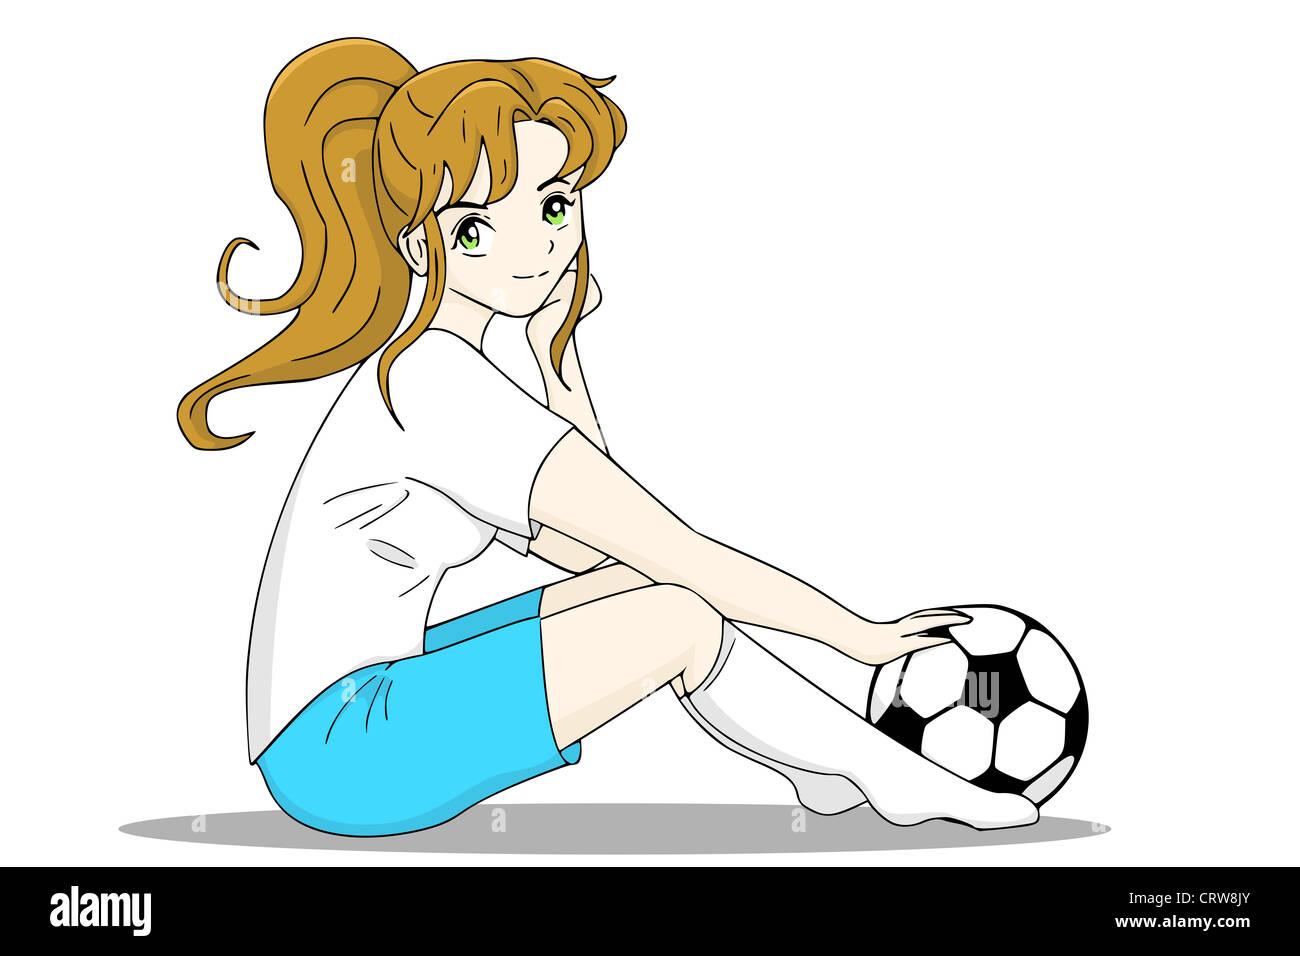 Girl with football - Stock Image